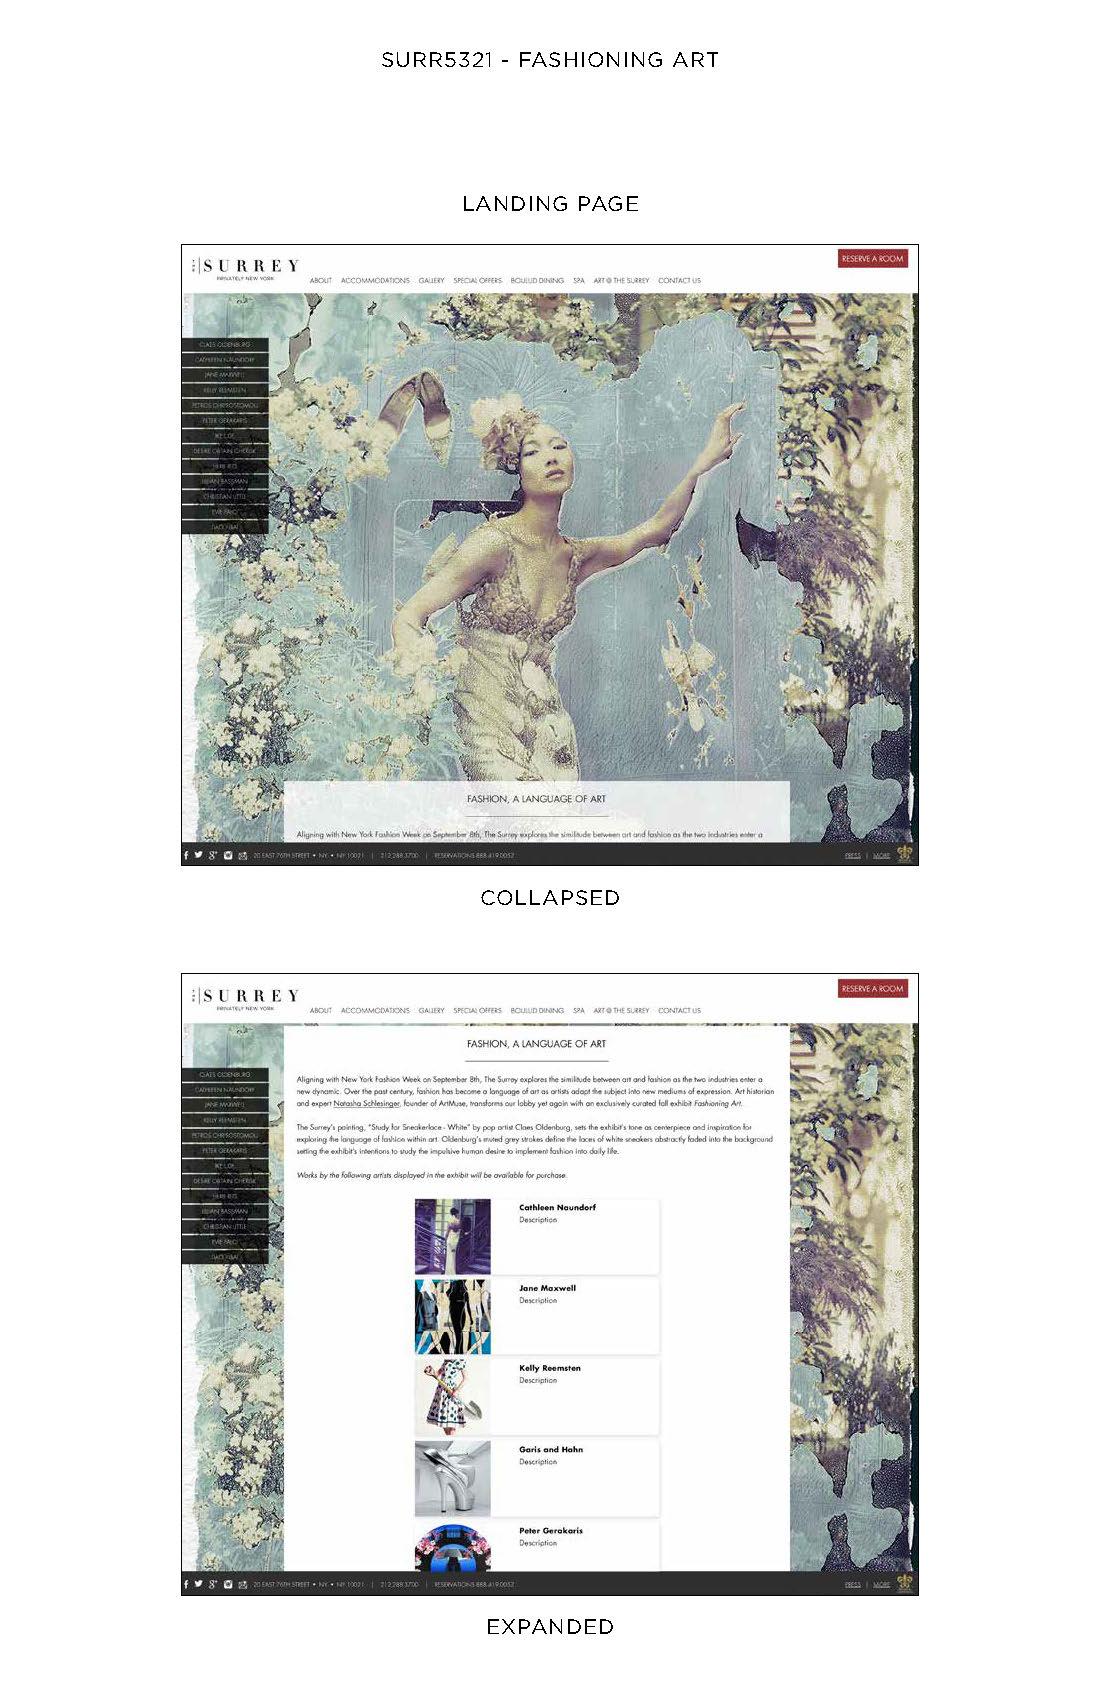 SURR5321-FashioningArt-RD3a_Page_3.jpg